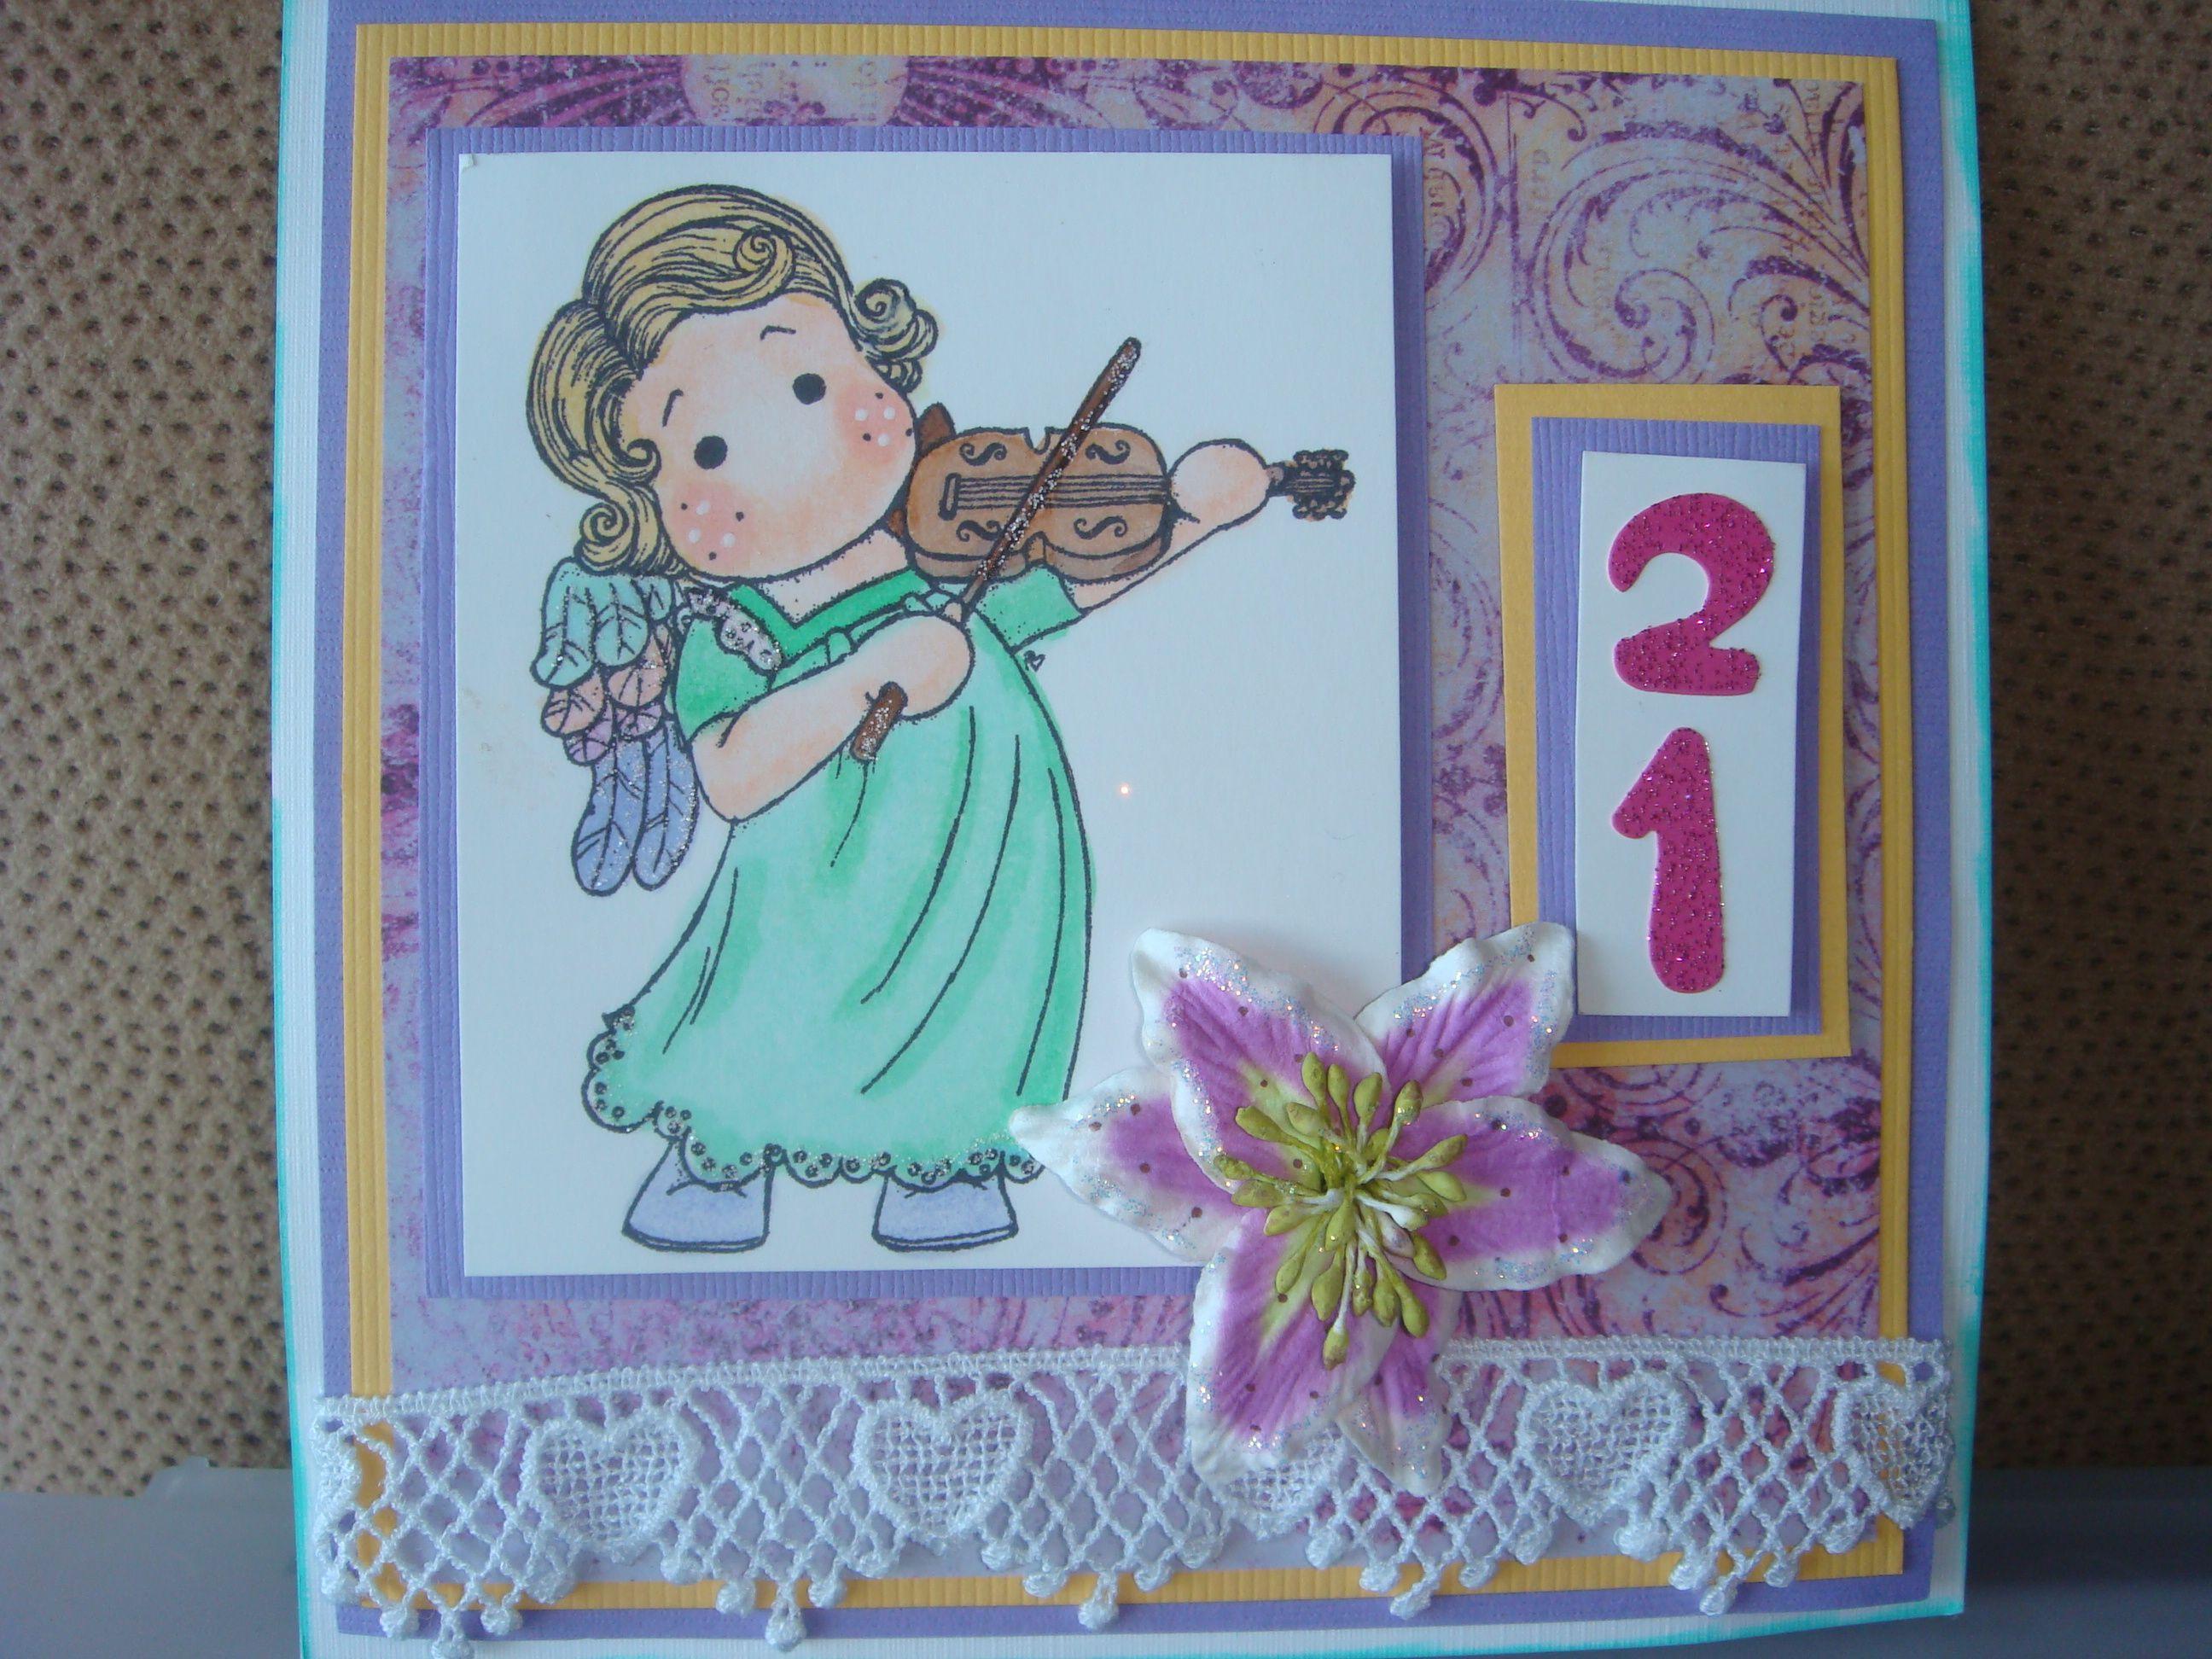 21st Birthday card, Magnolia Tilda with violin